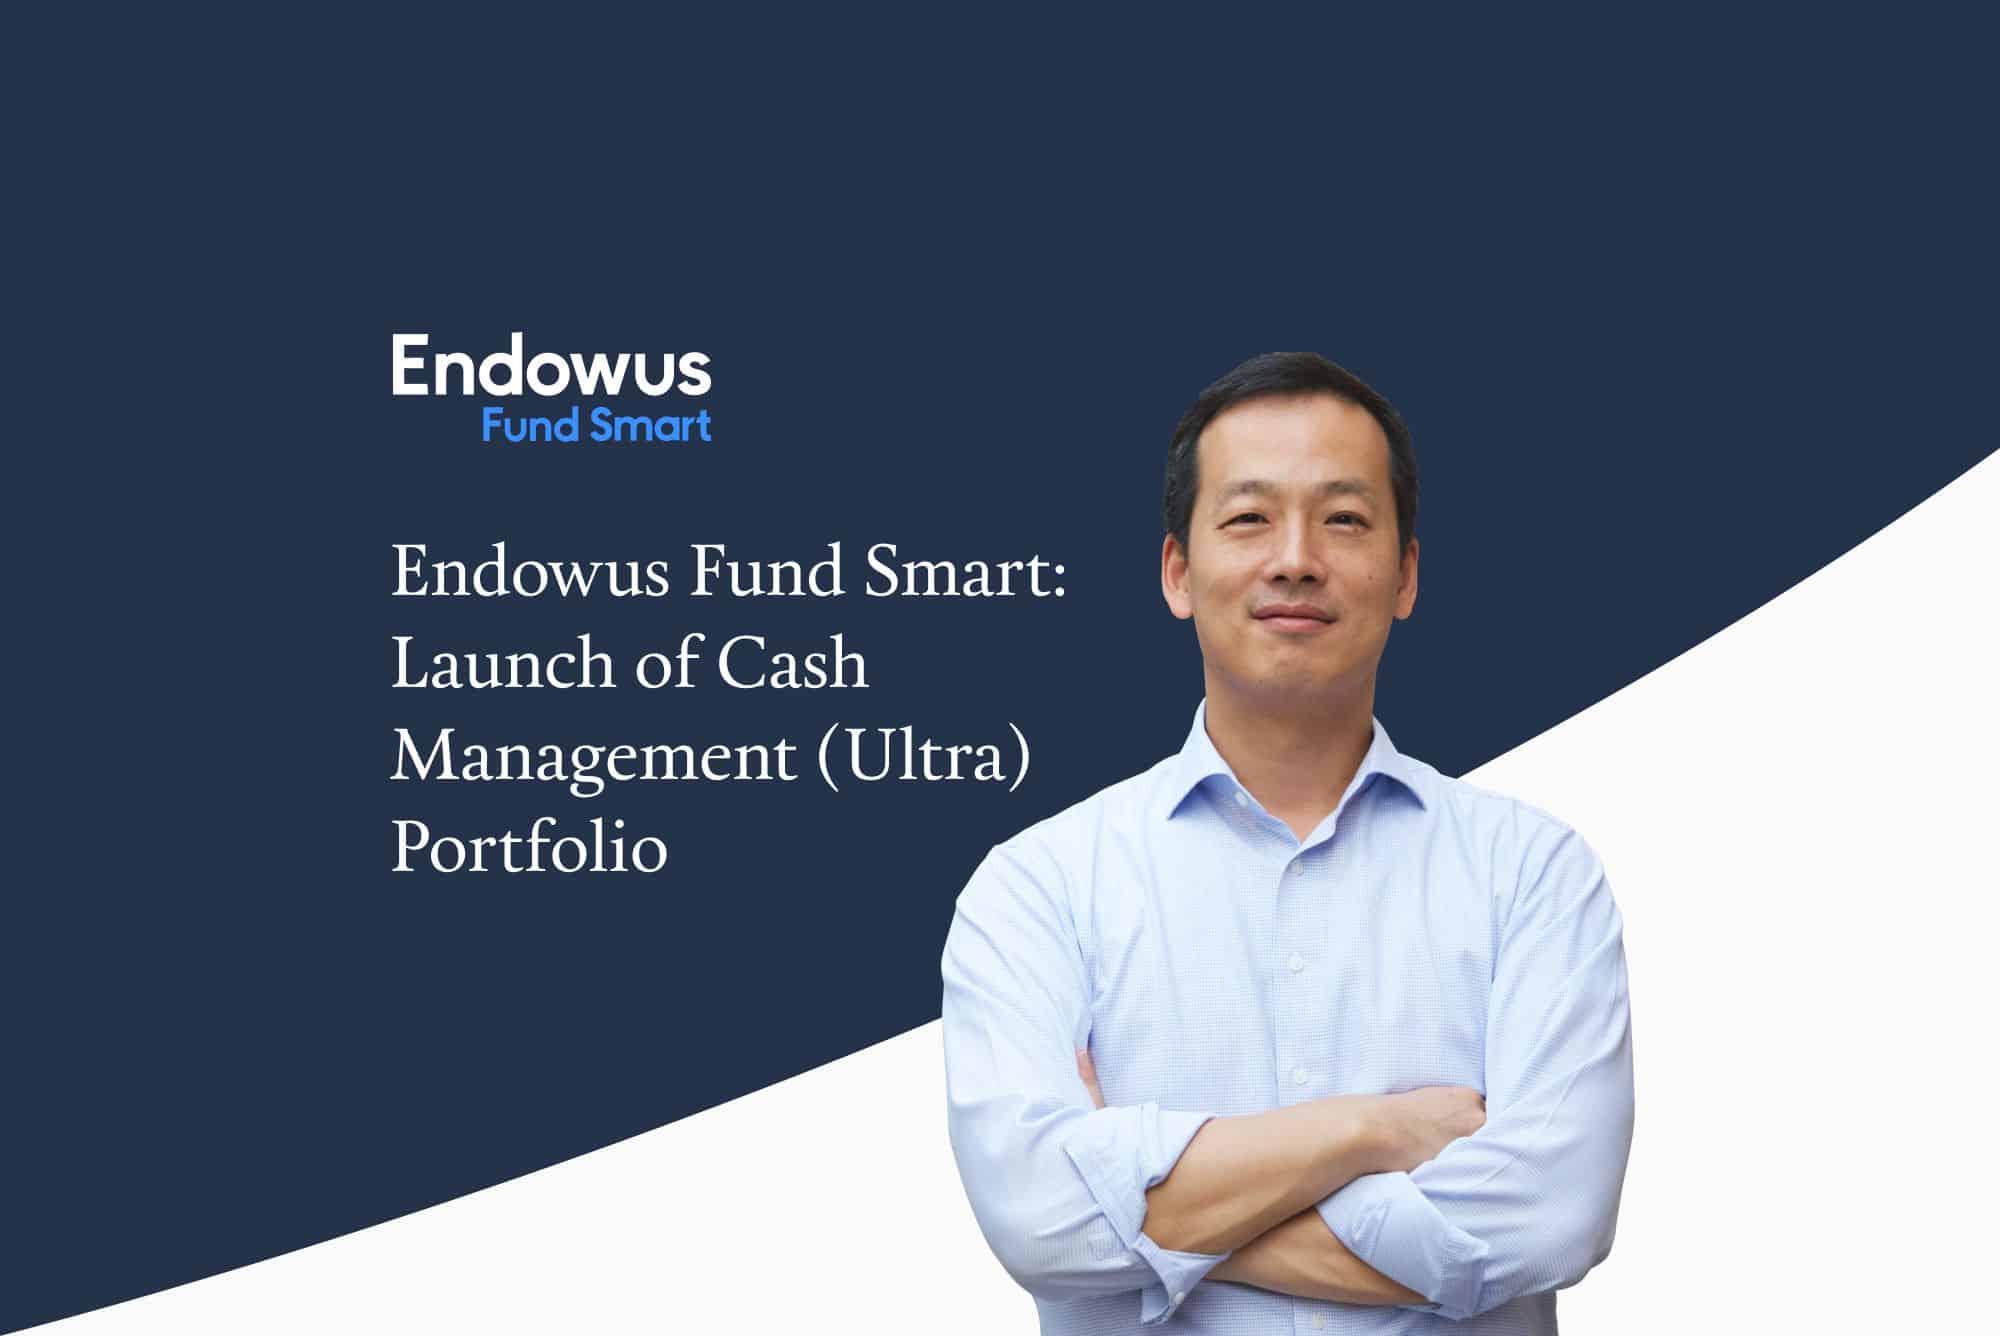 Endowus Fund Smart: Launch of Cash Management (Ultra) Portfolio